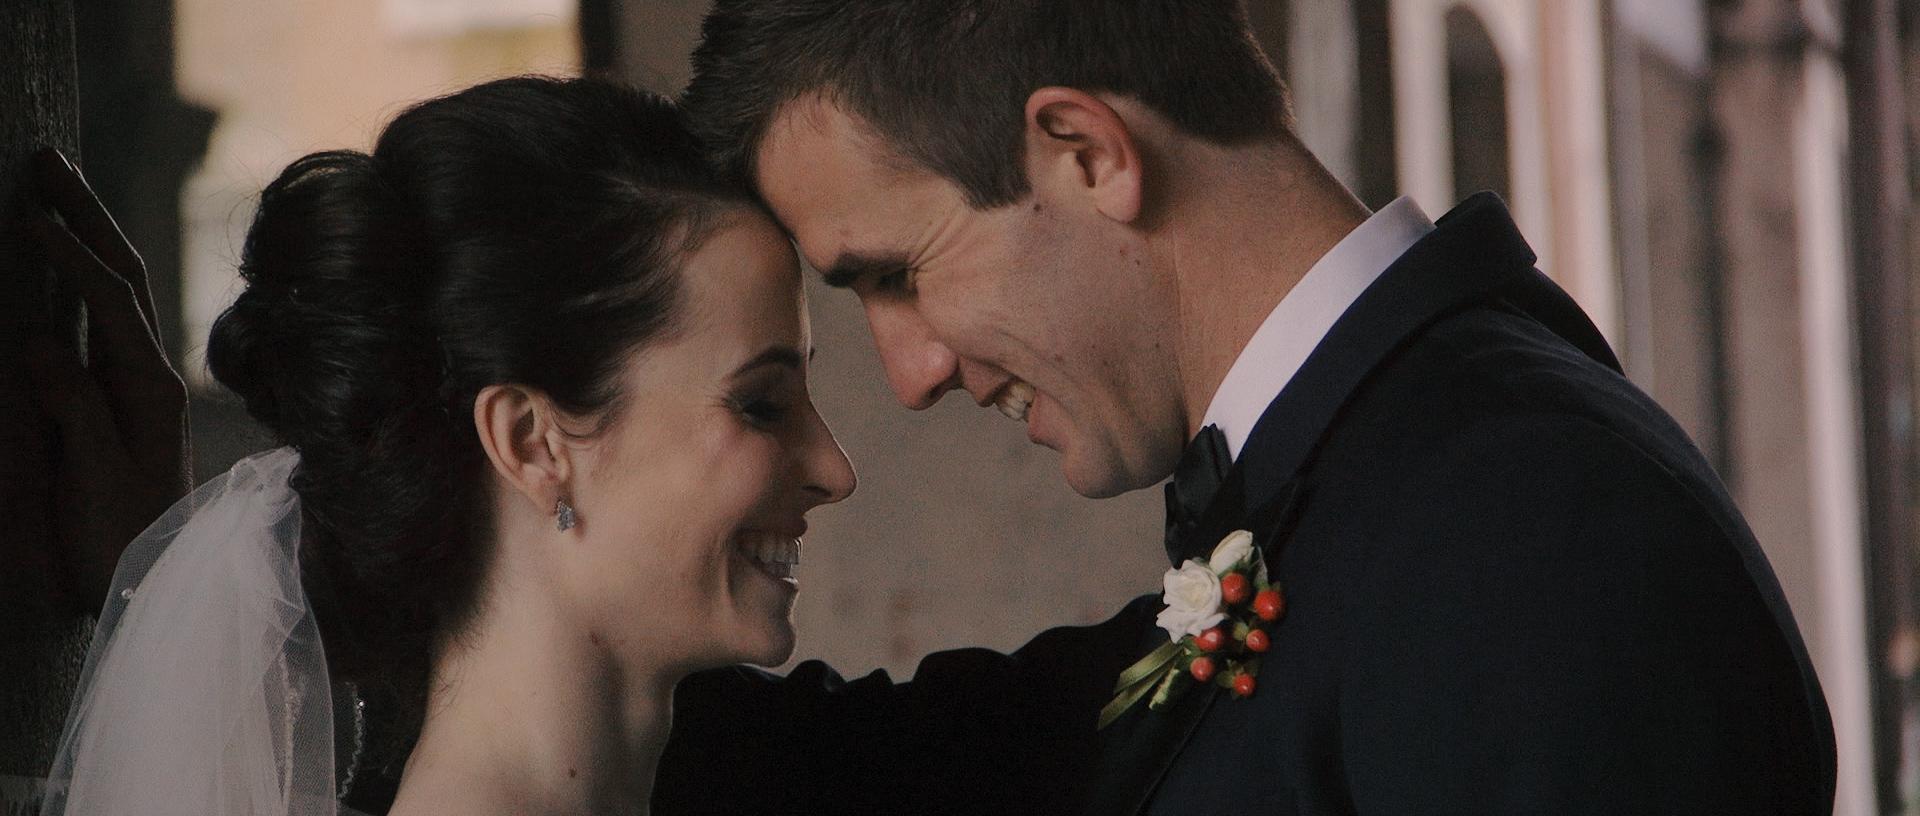 Destination wedding in Venice Whitesfilm videographer